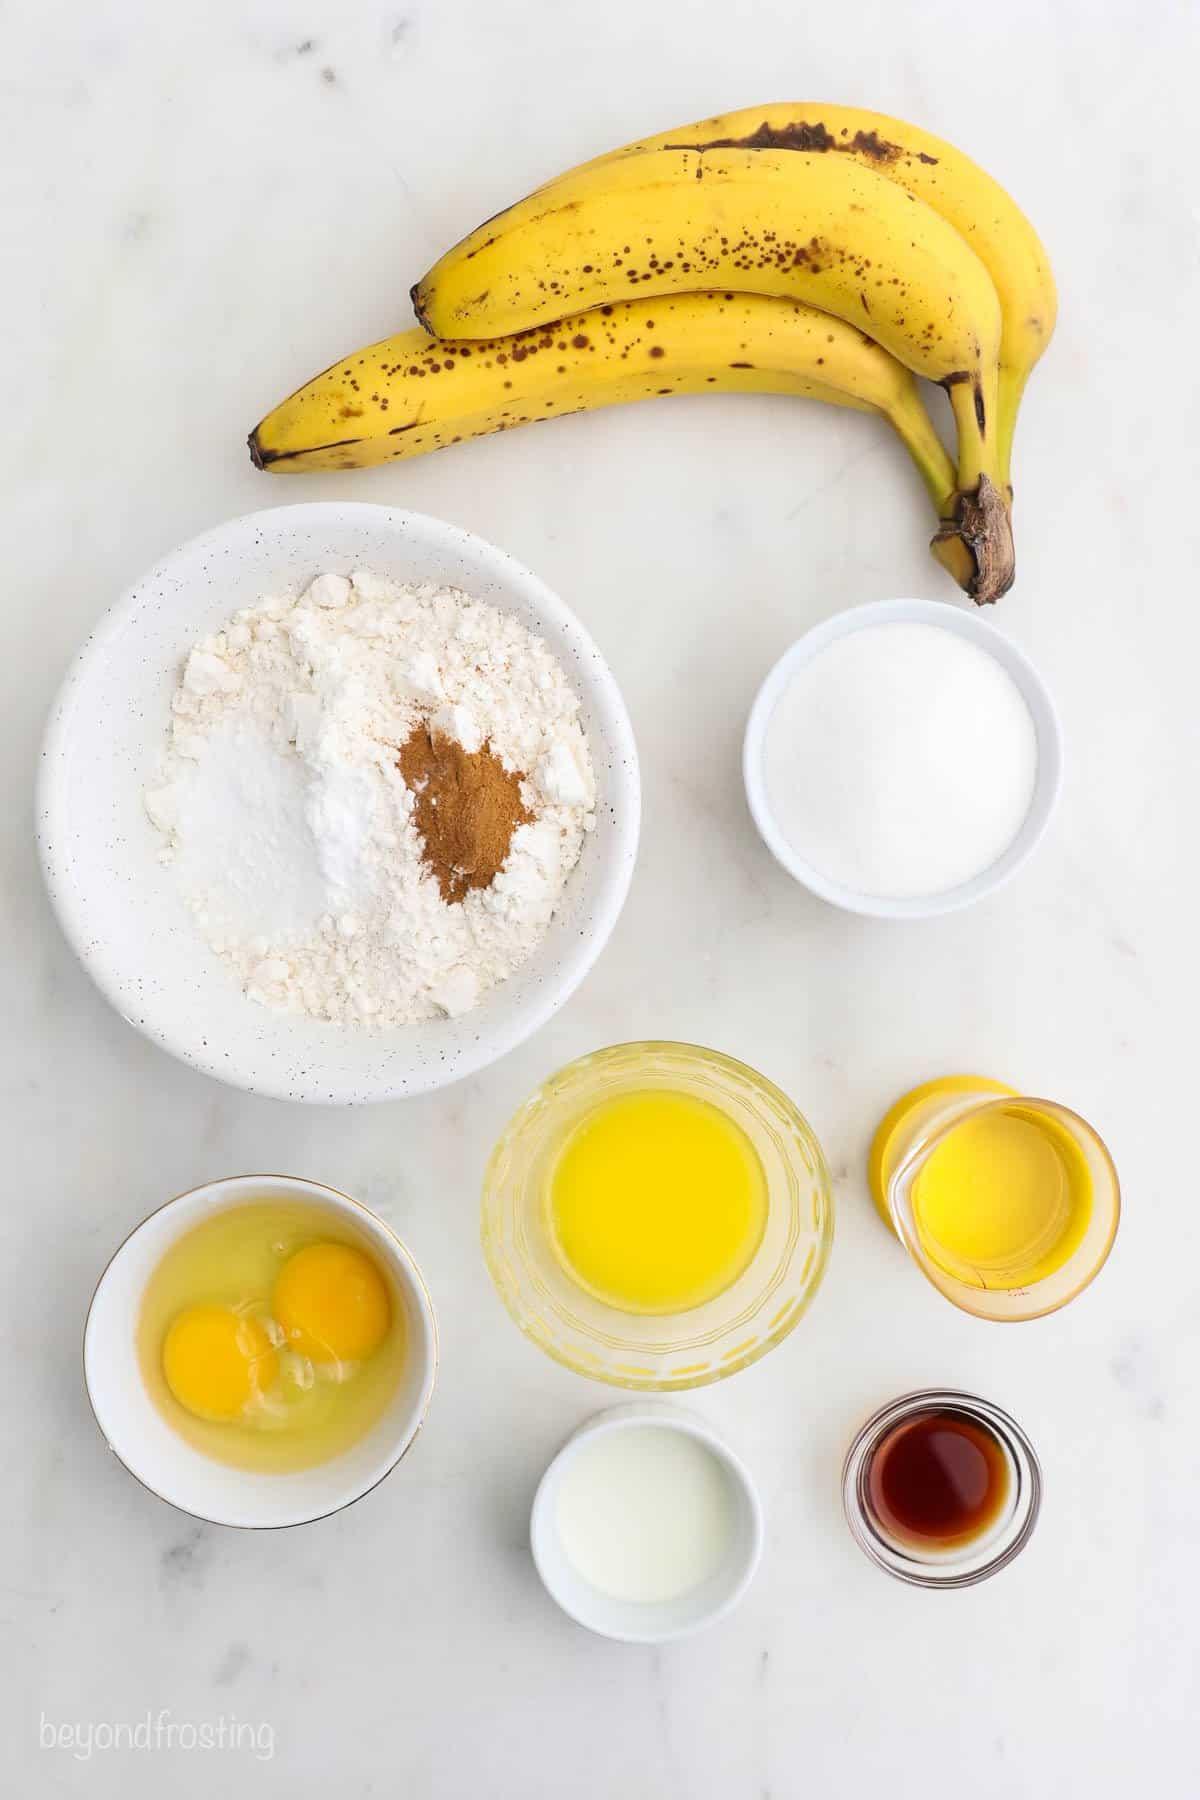 All of the ingredients for banana bread: baking soda, baking powder, salt, vanilla, cinnamon, bananas, sugar, flour, oil, eggs, and milk.